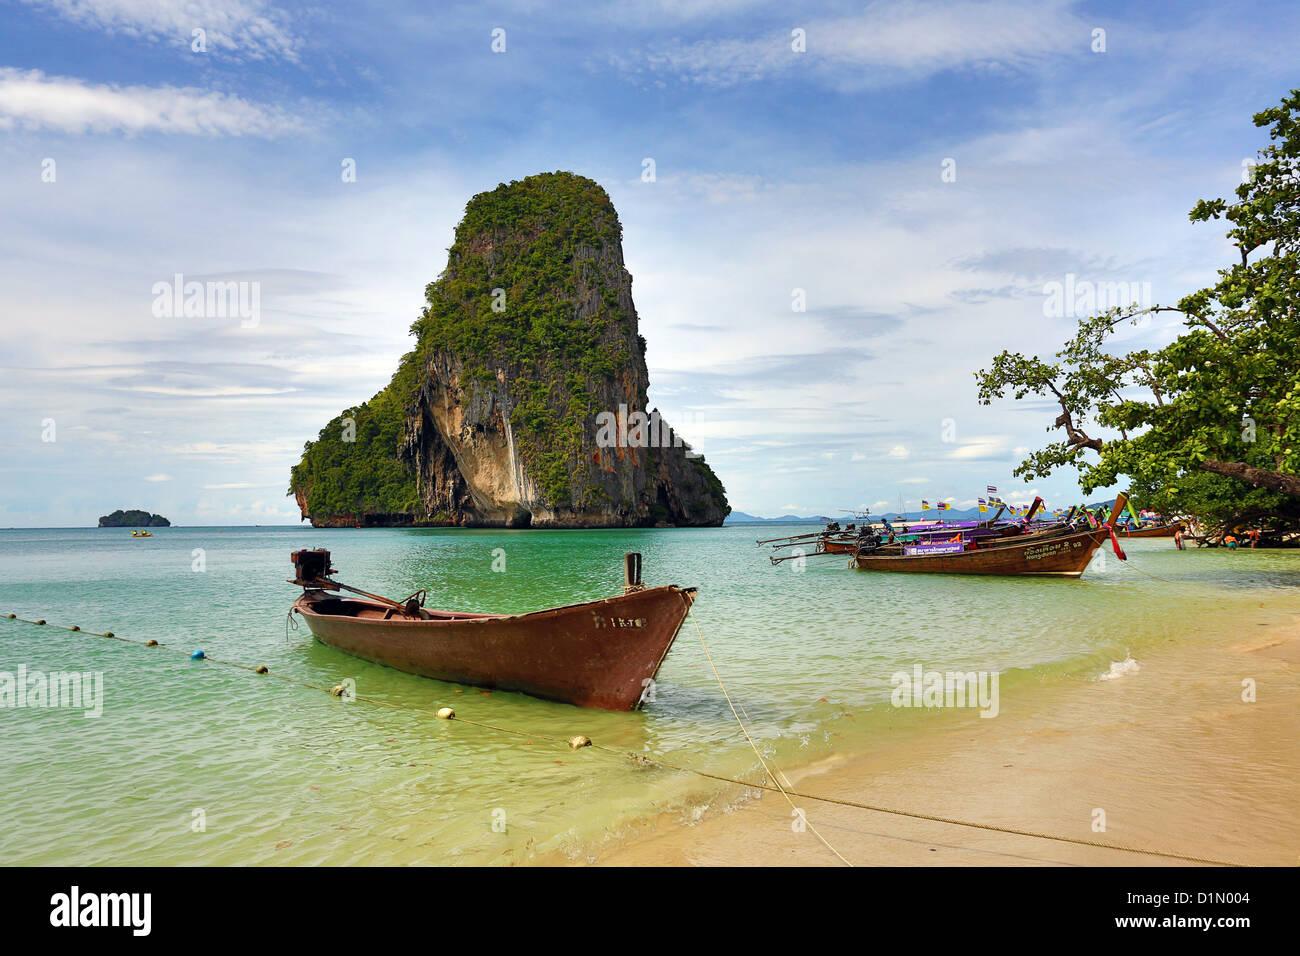 Kalkstein-Rock-Formation aus Phranang Cave Beach, Railay Beach, Krabi, Phuket, Thailand Stockbild